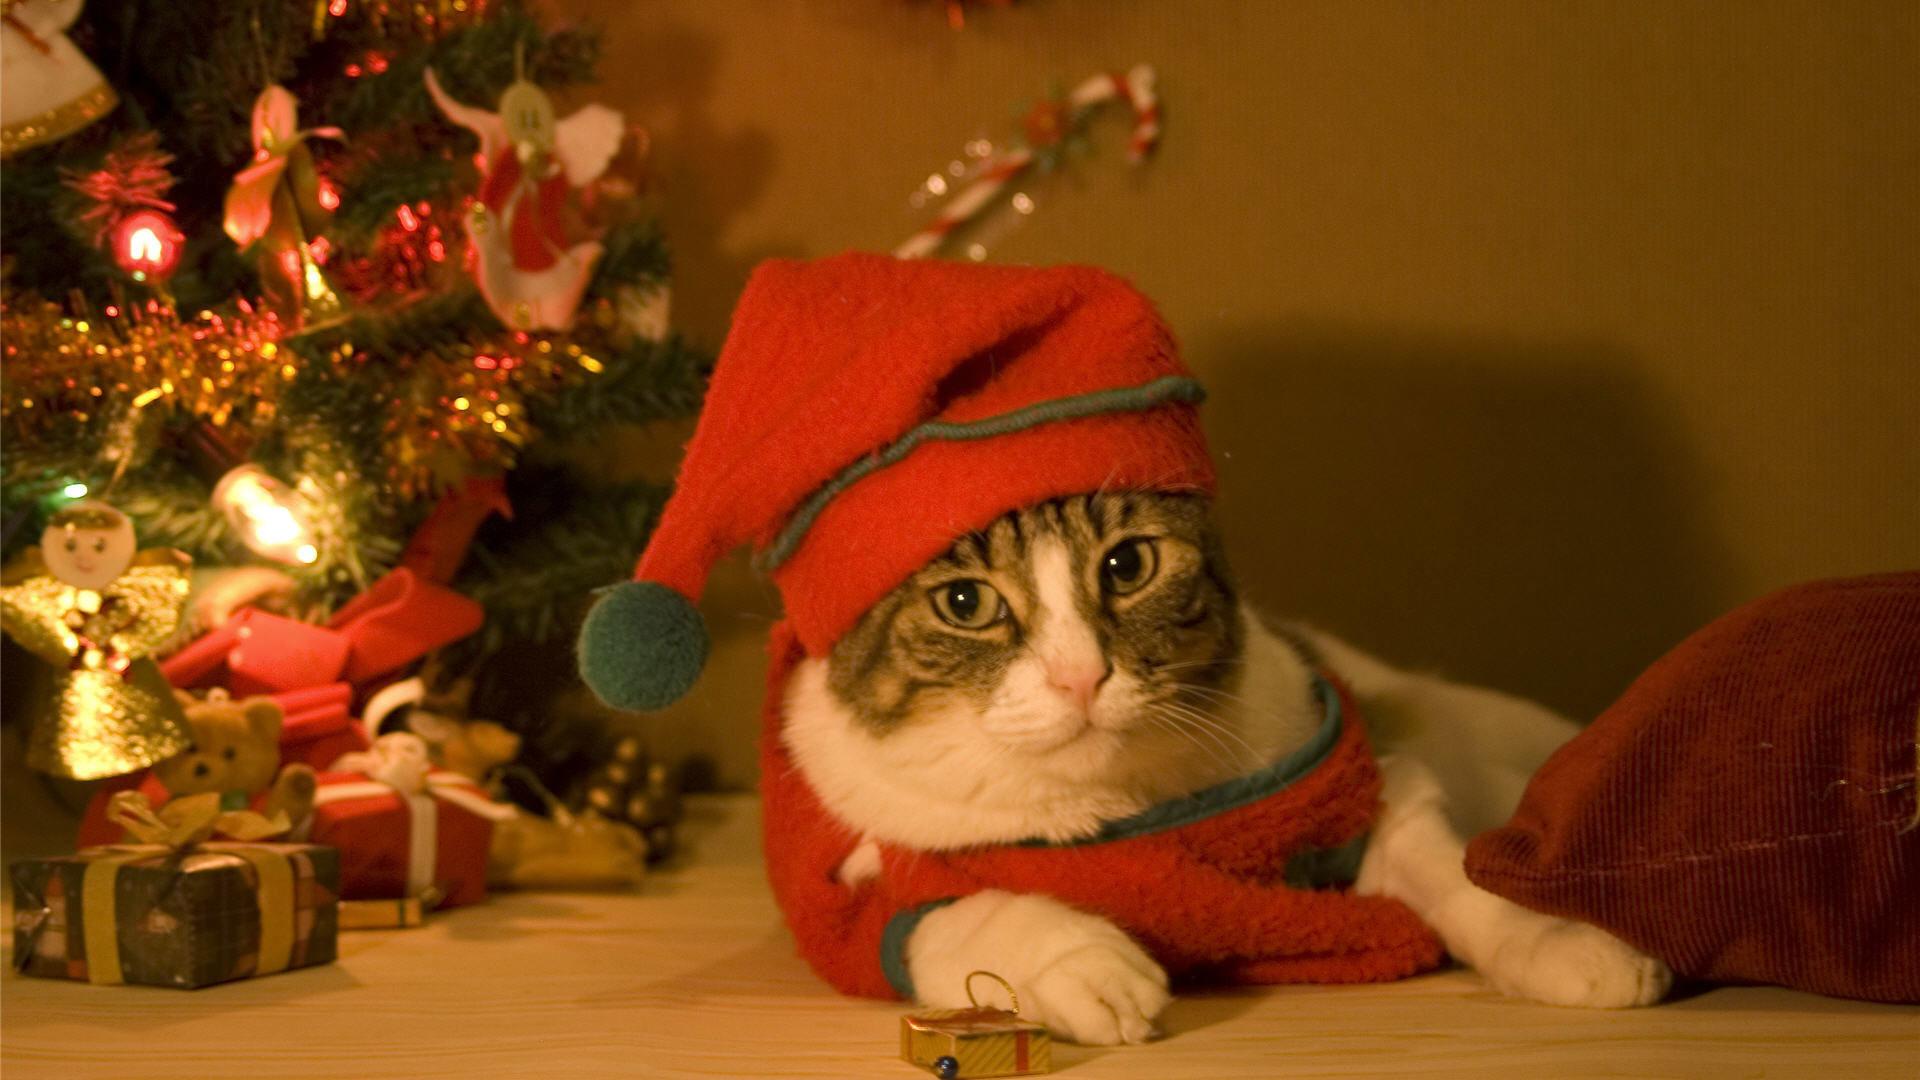 Cute Christmas Desktop Backgrounds 1